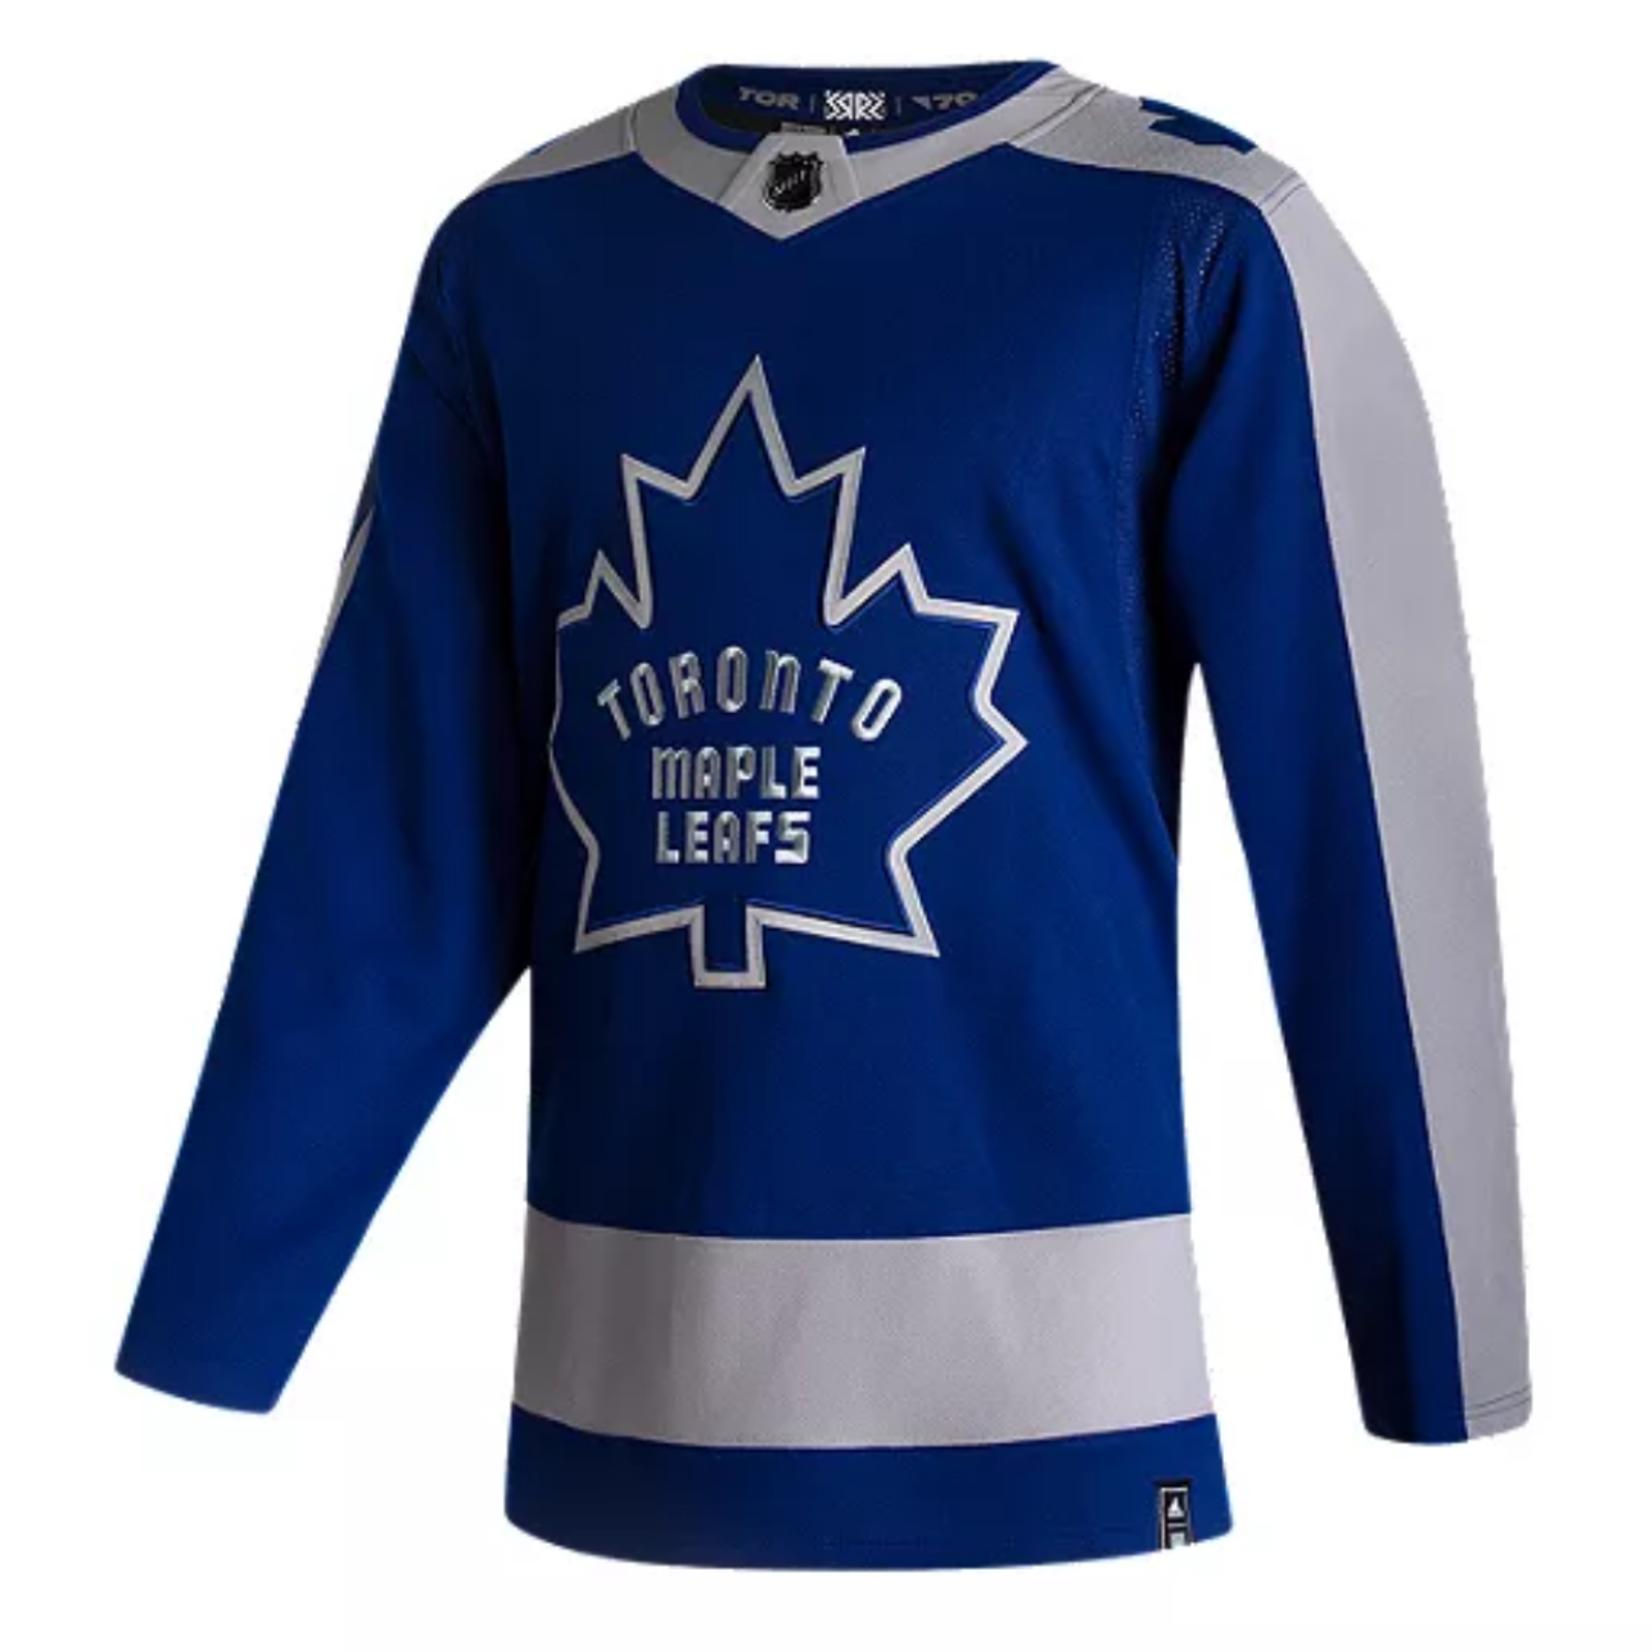 Adidas NHL Reverse Retro Jersey